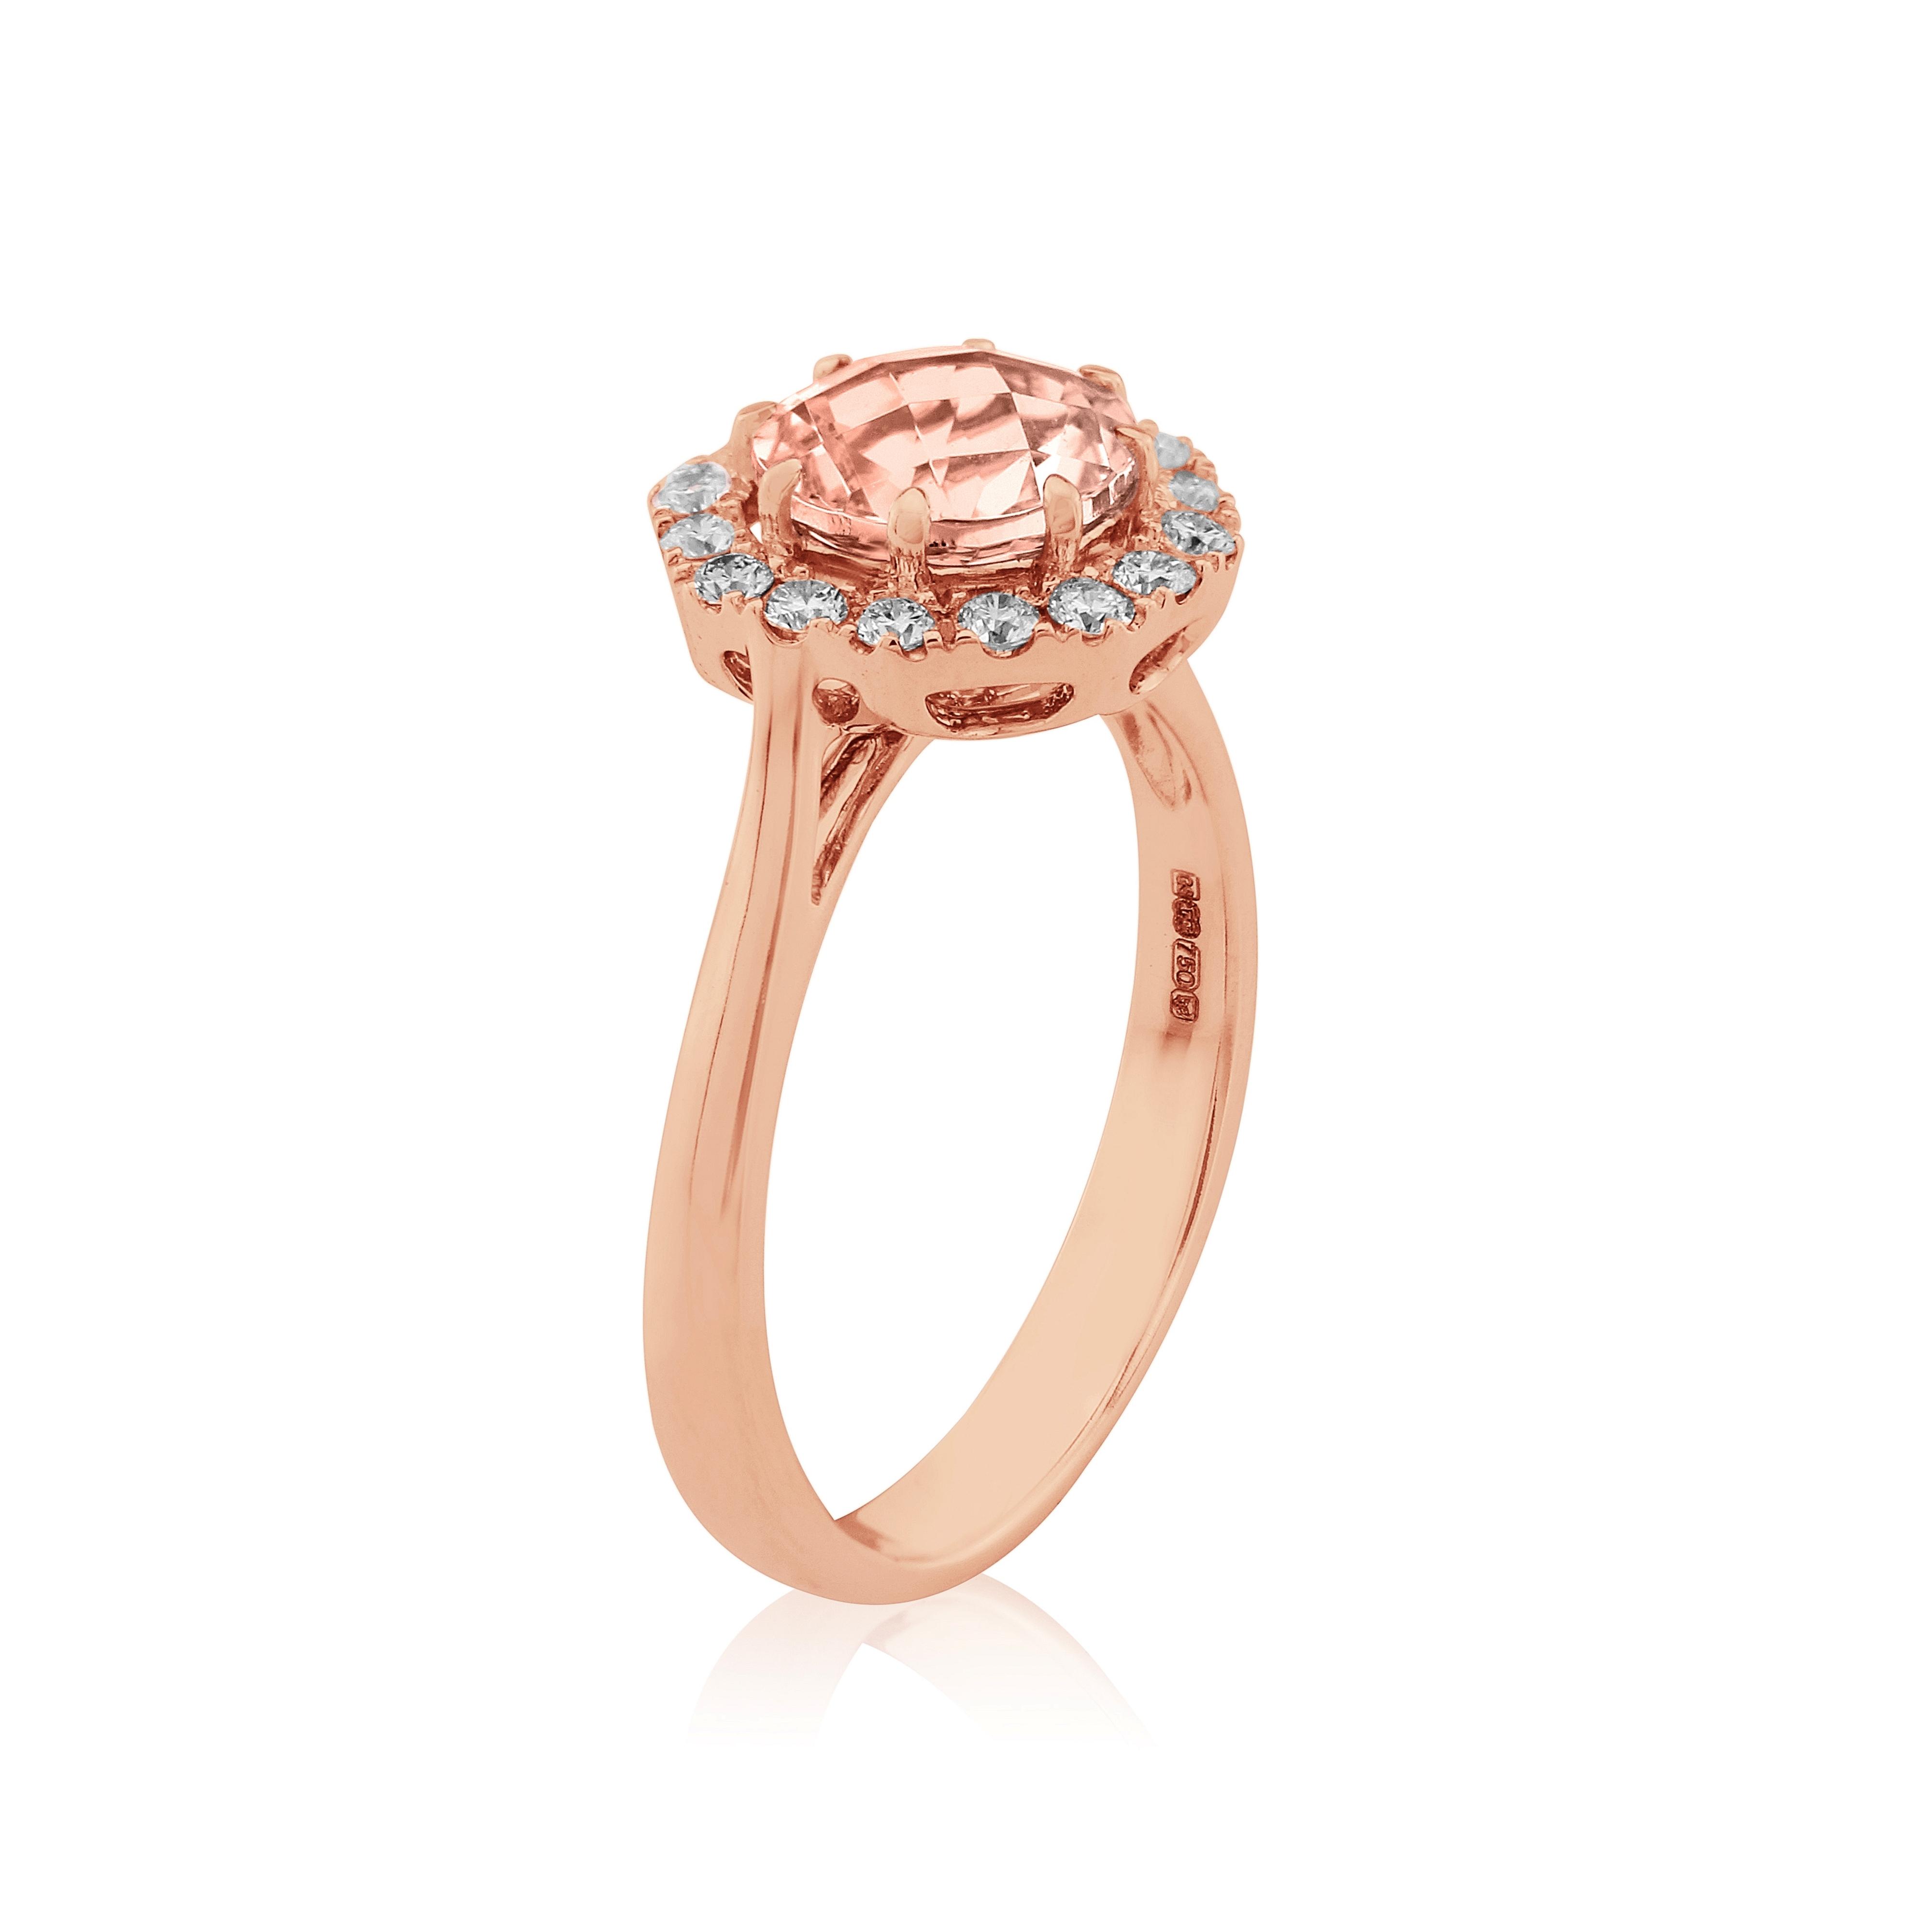 18ct Rose Gold Morganite and Diamond Ring